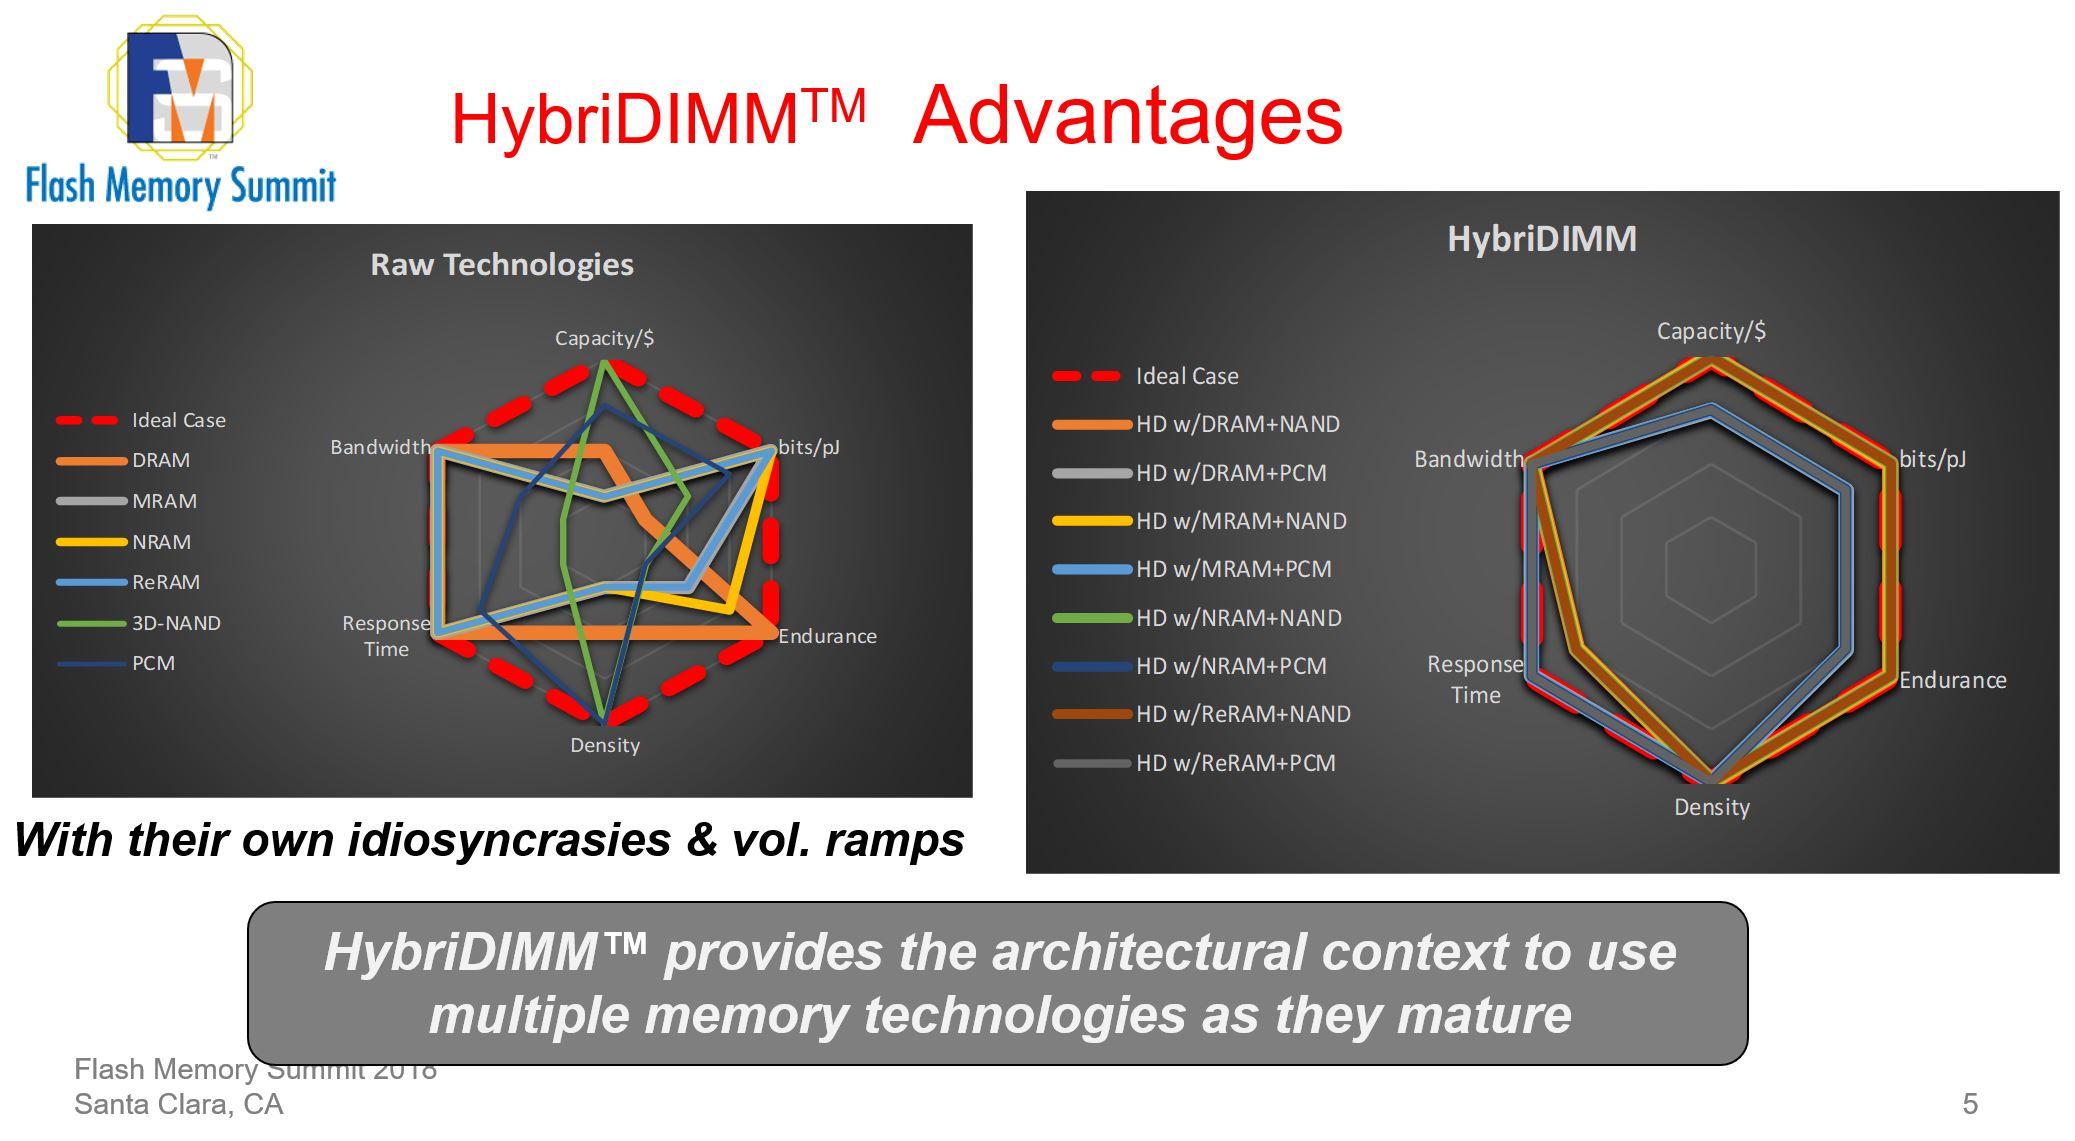 Netlist HybriDIMM Advantages